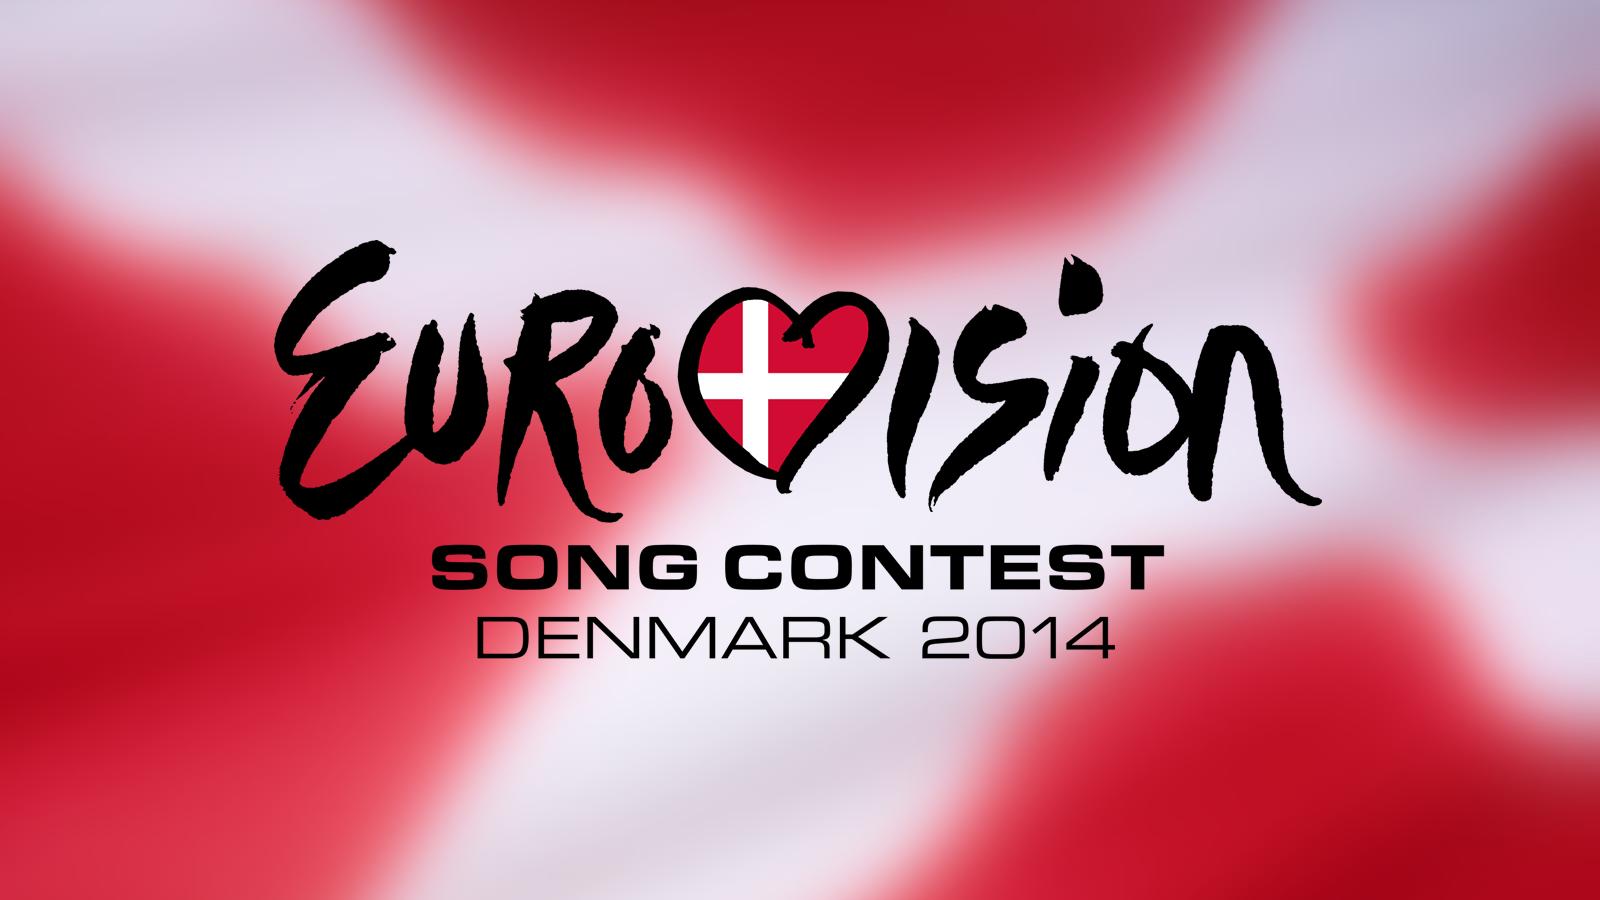 Eurovision 2014. Oddities - Denmark!